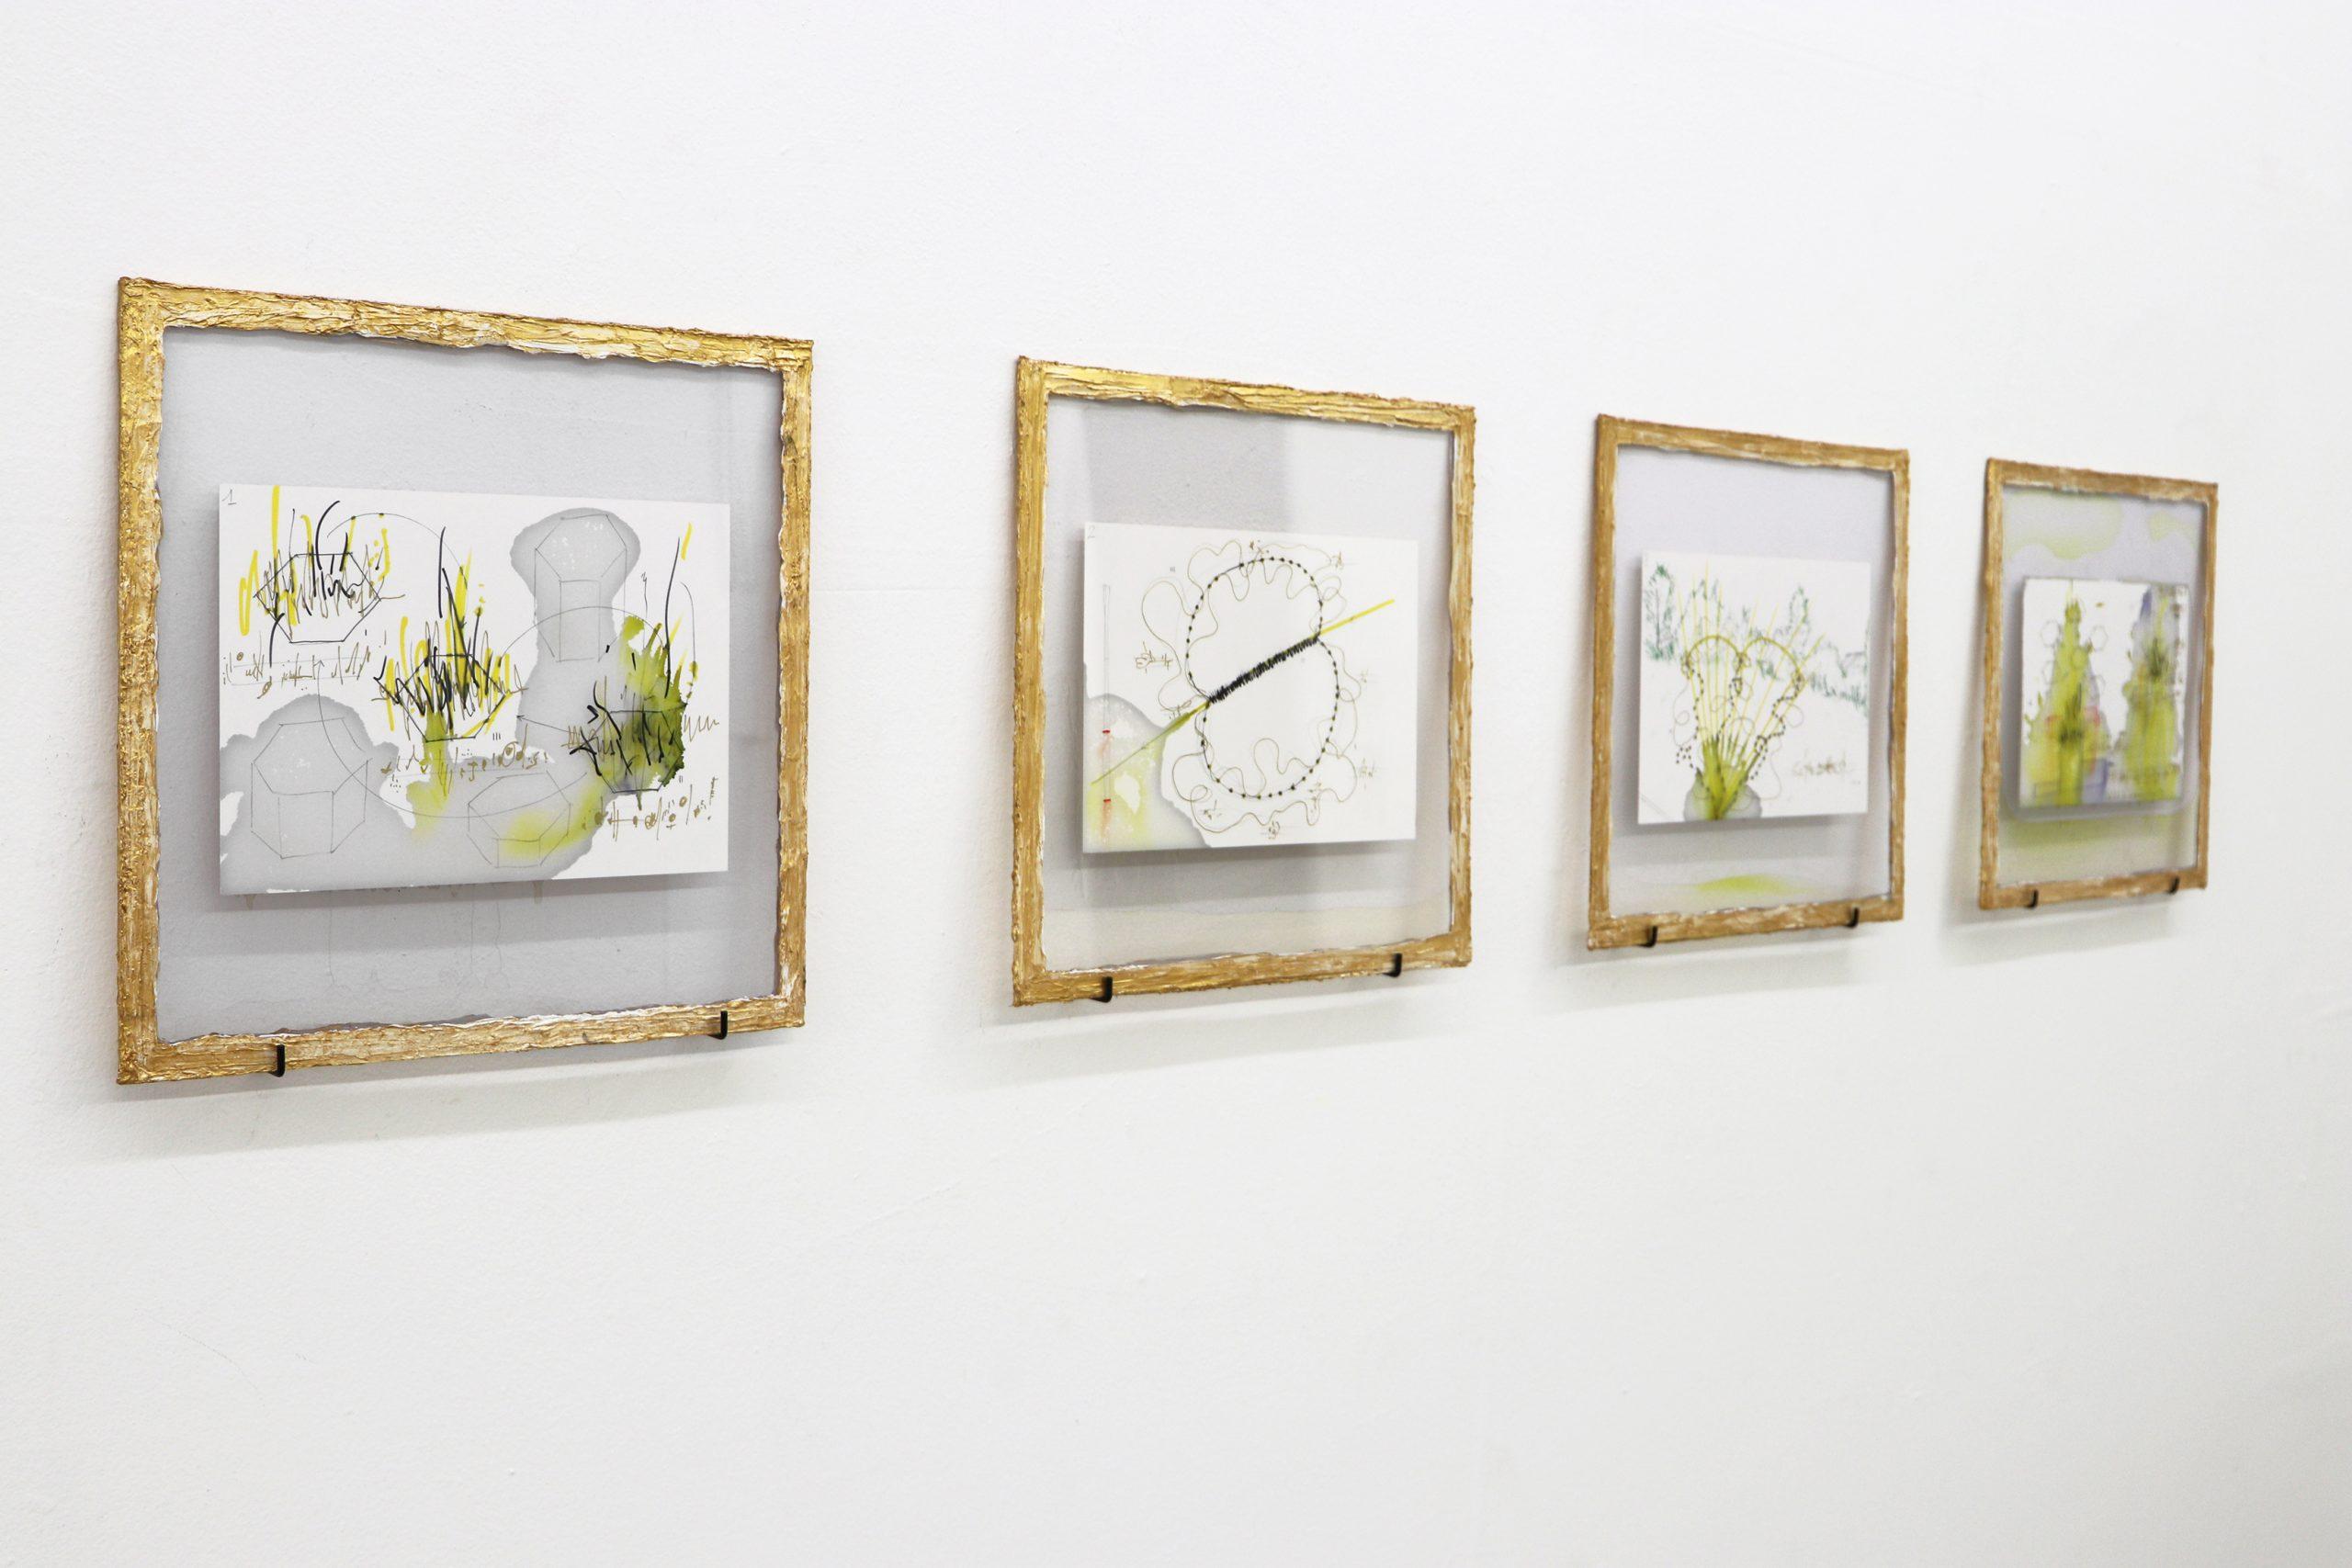 C0039_Performance drawings_Luca Bosani